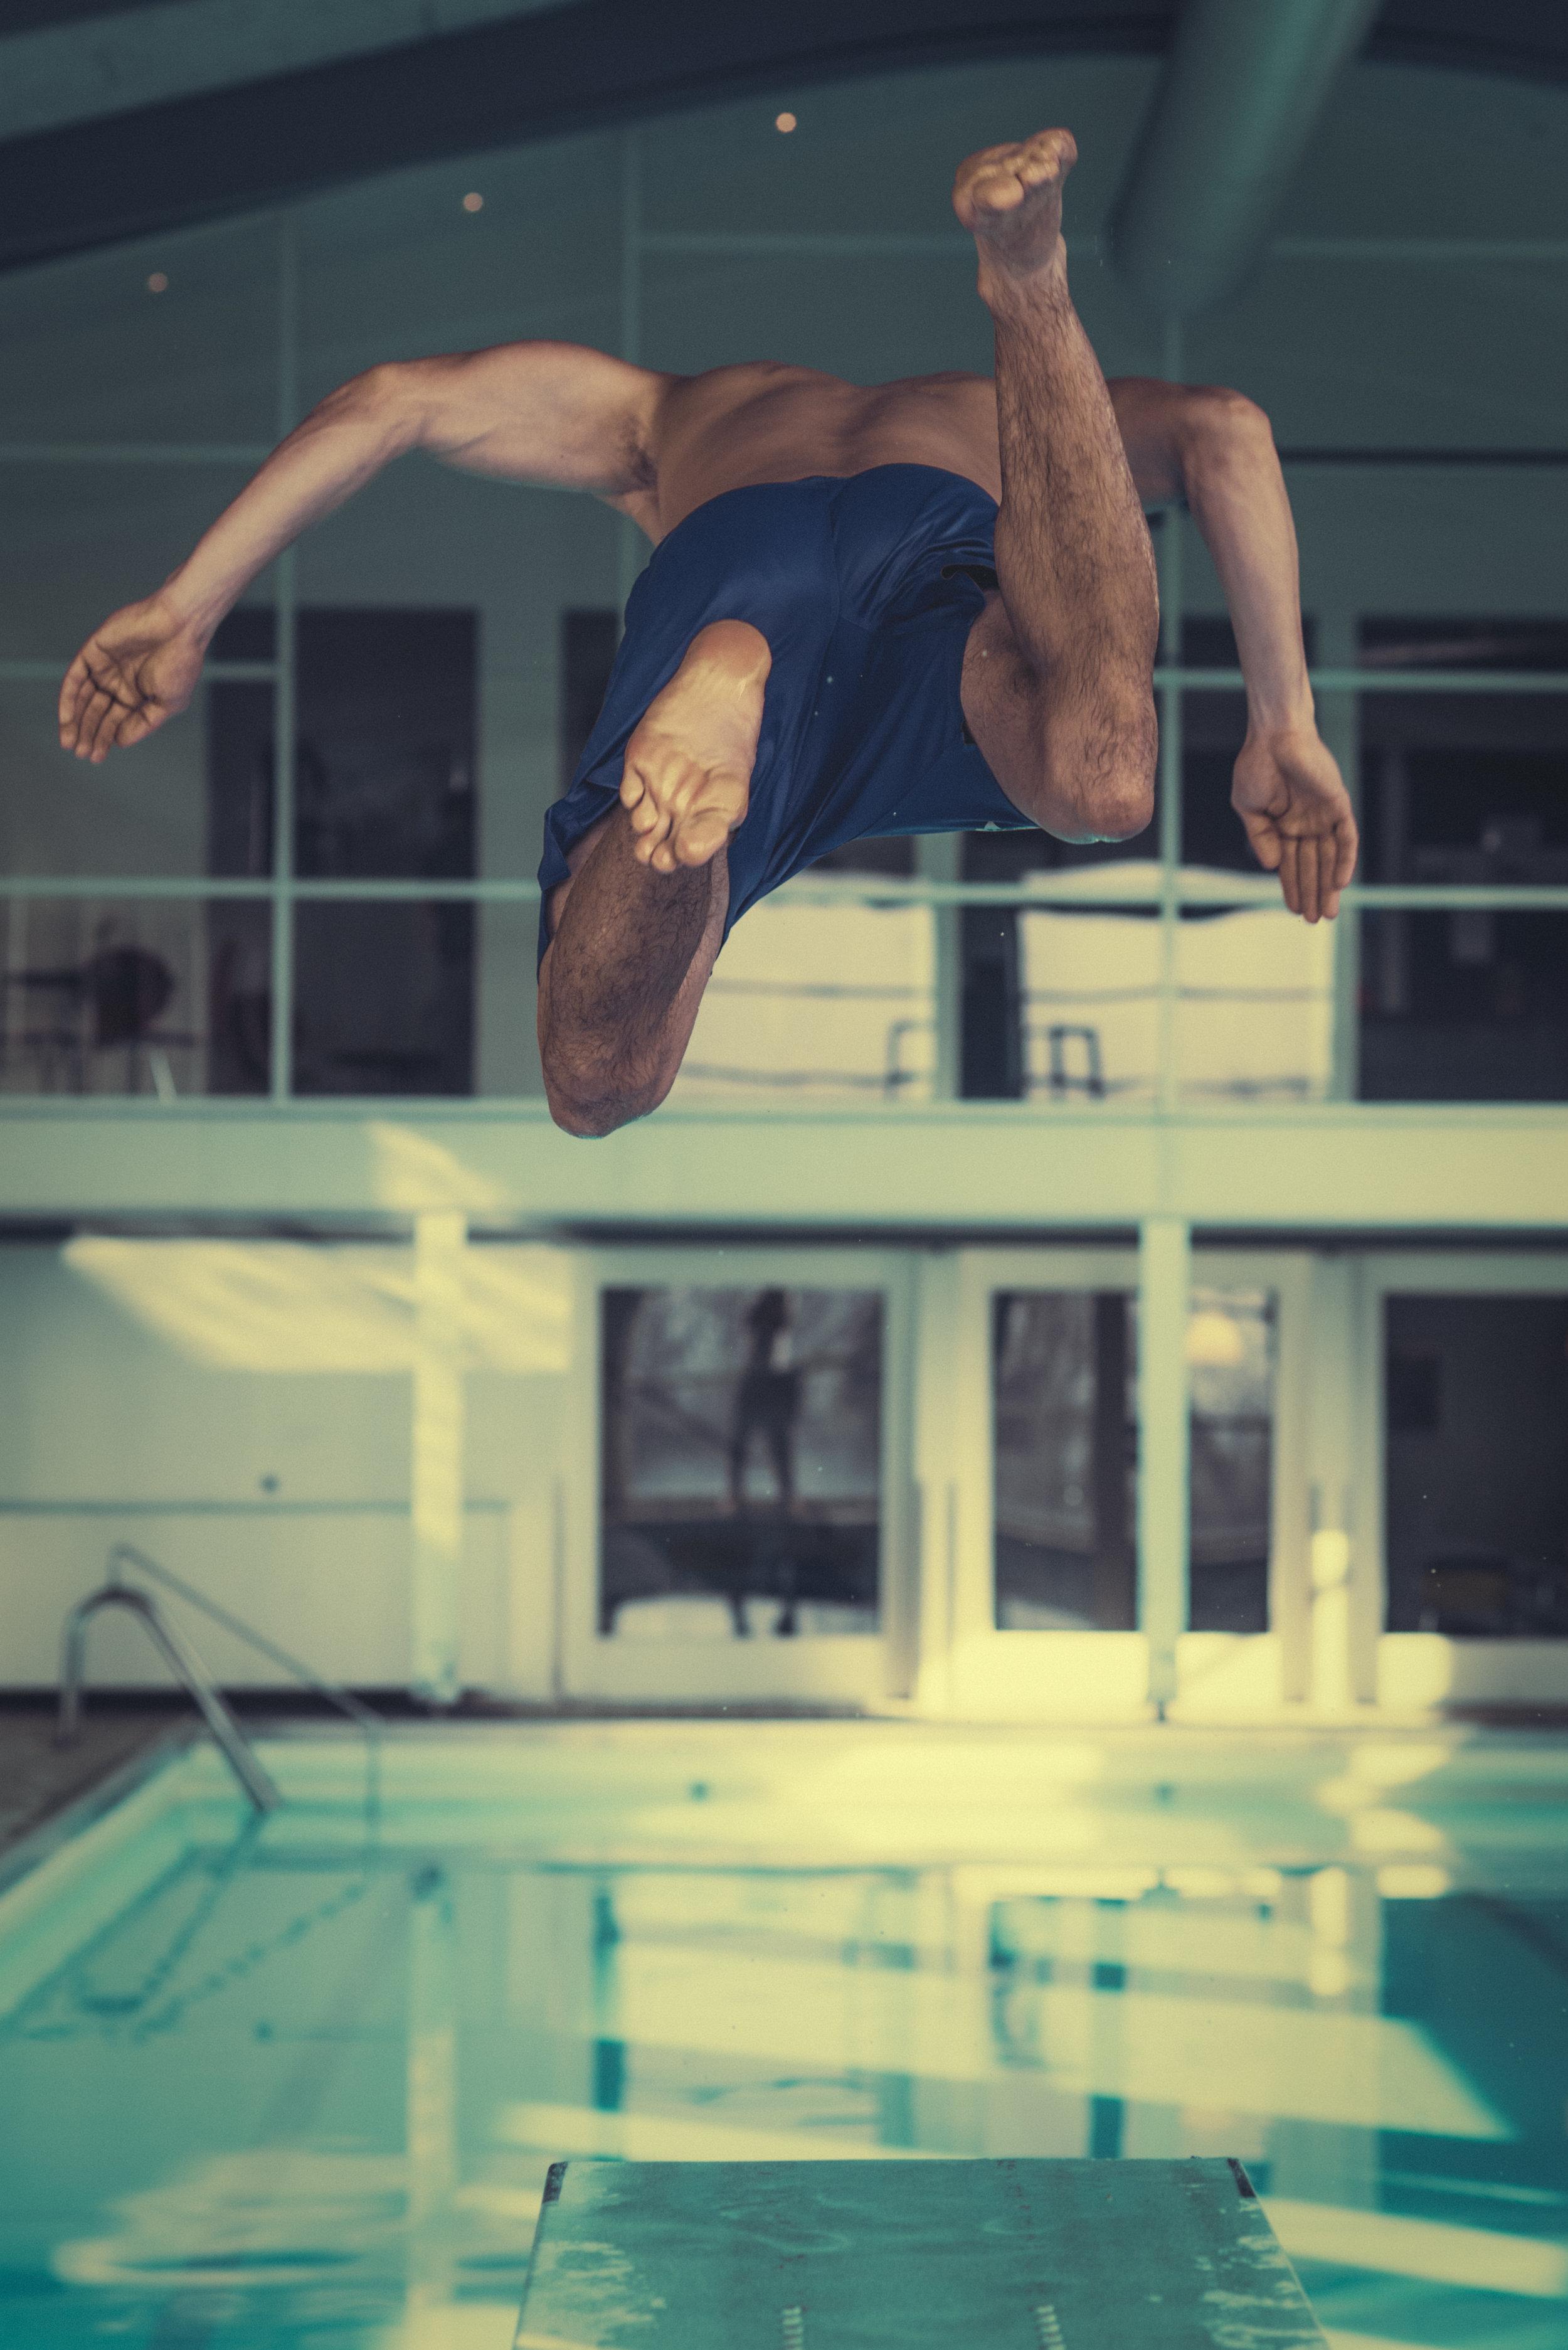 Gerlev_svømmer-7900.jpg